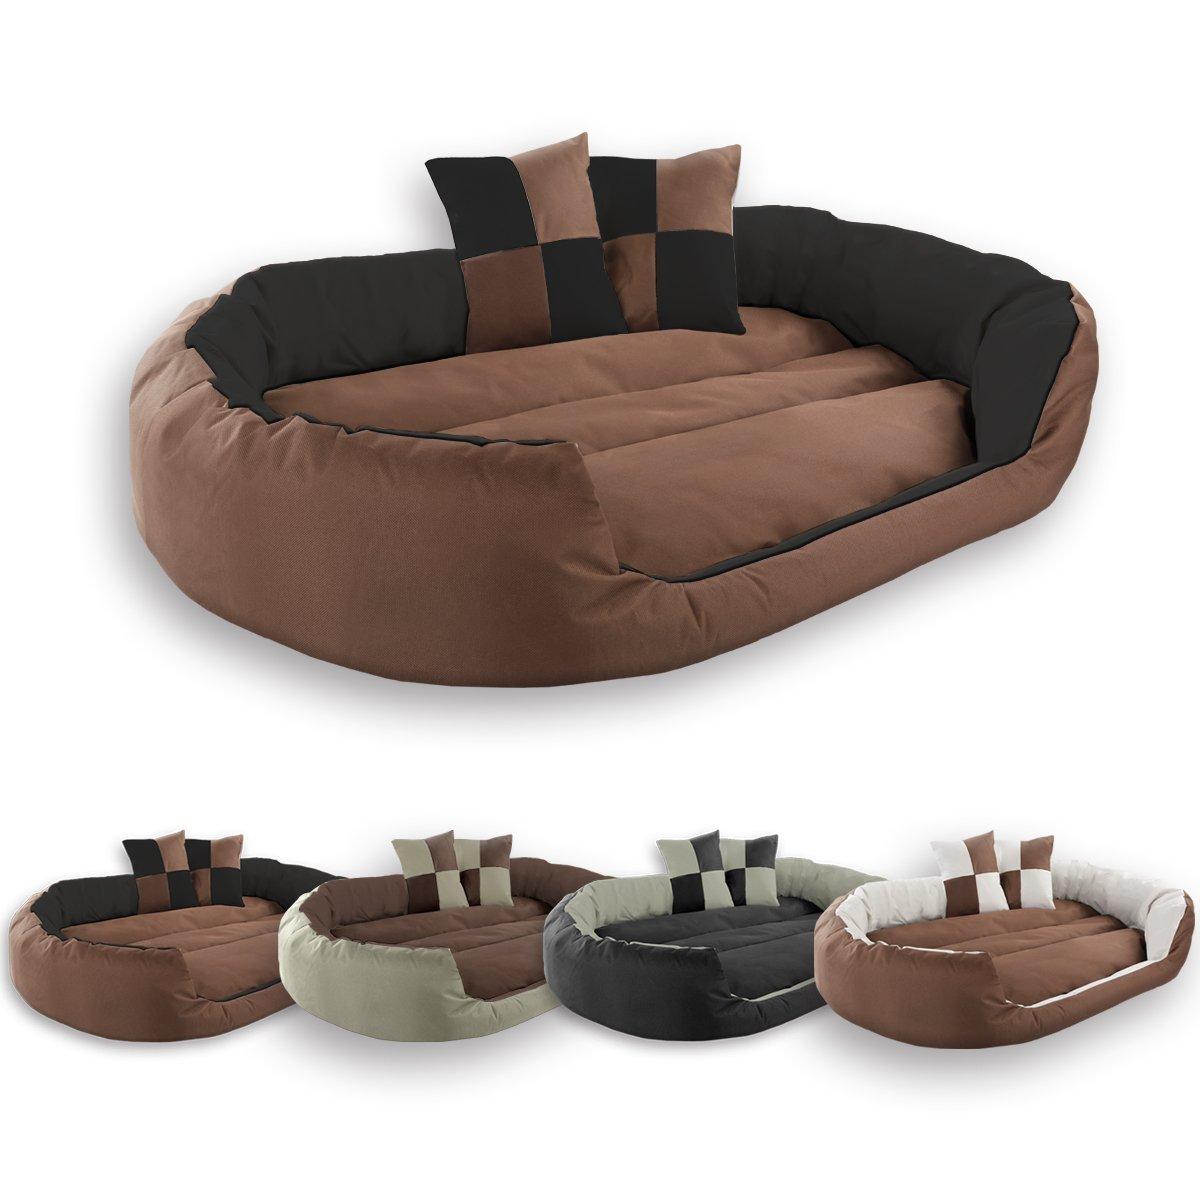 hundebett test 2019 welches hundebett ist das beste. Black Bedroom Furniture Sets. Home Design Ideas